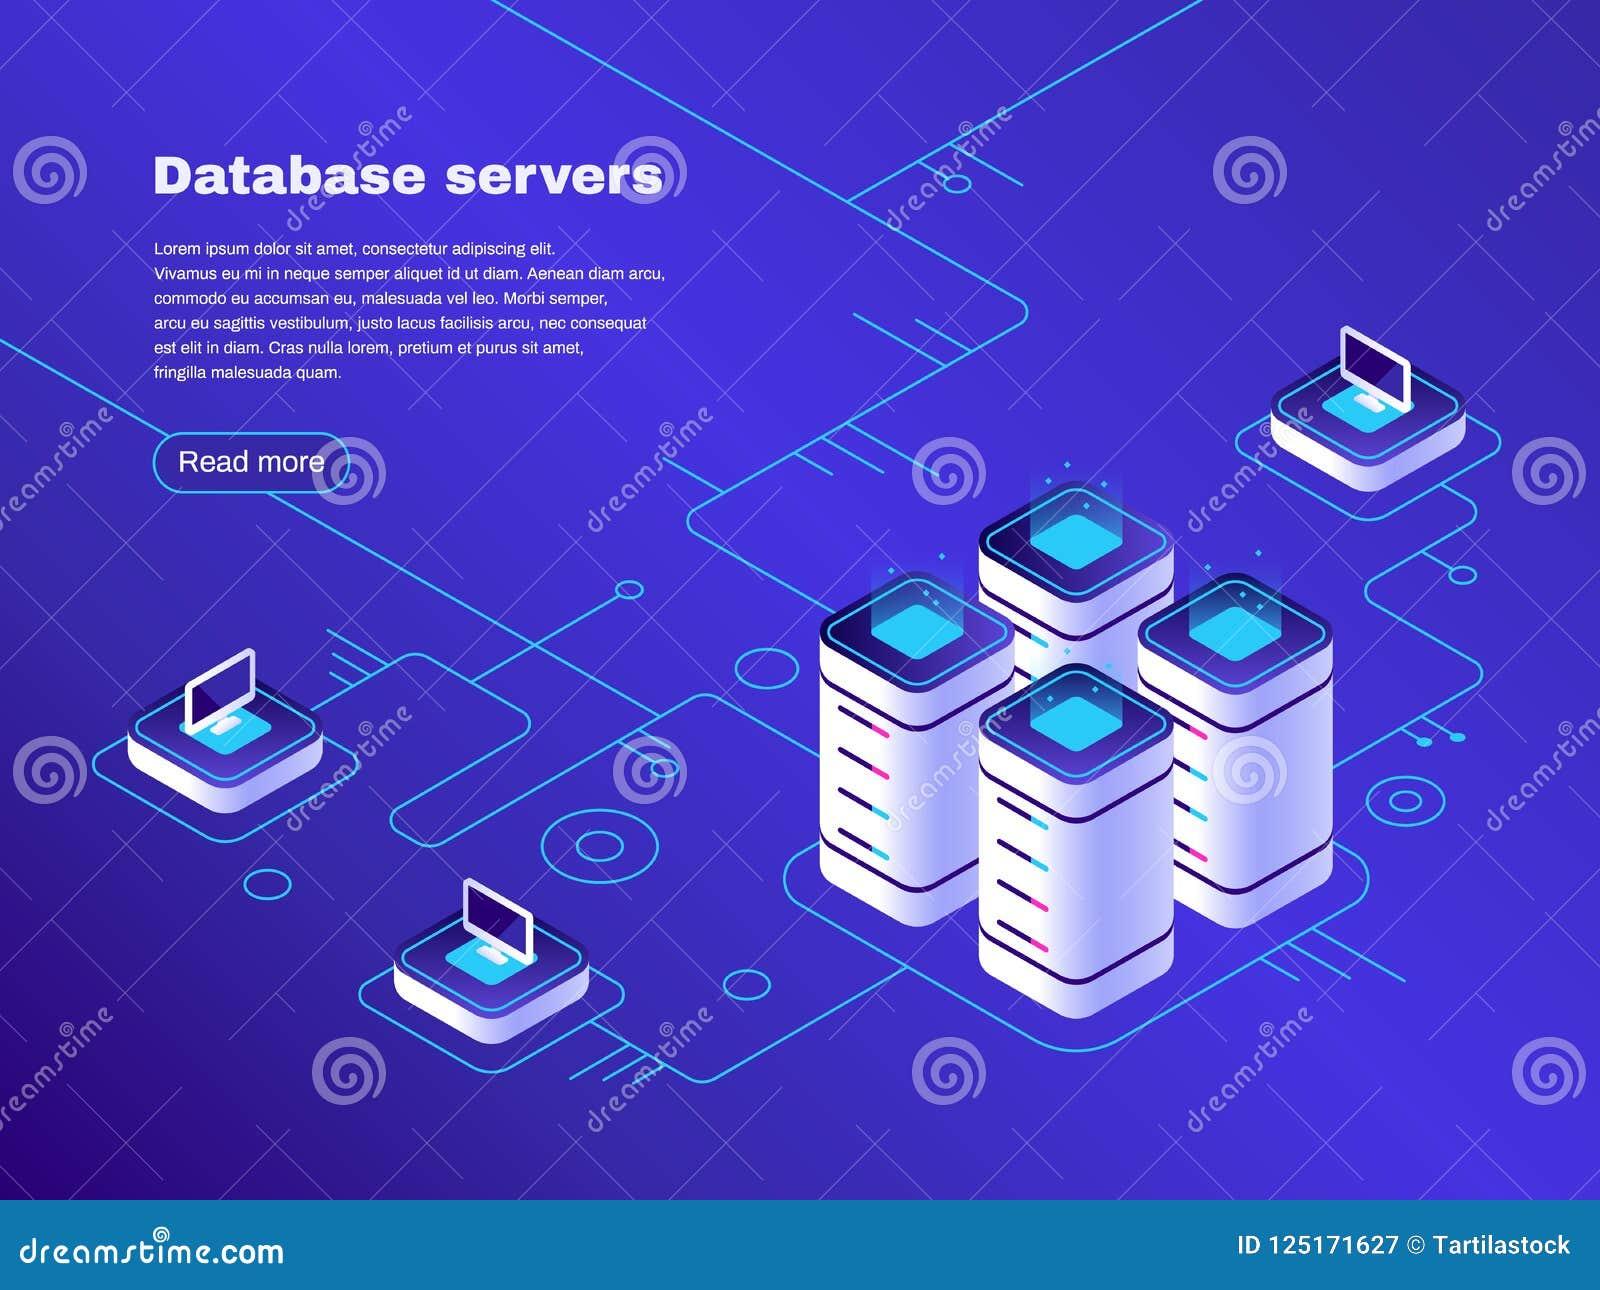 Database servers. Digital datacenter server network. Hosting tech support. Online cloud storage vector isometric